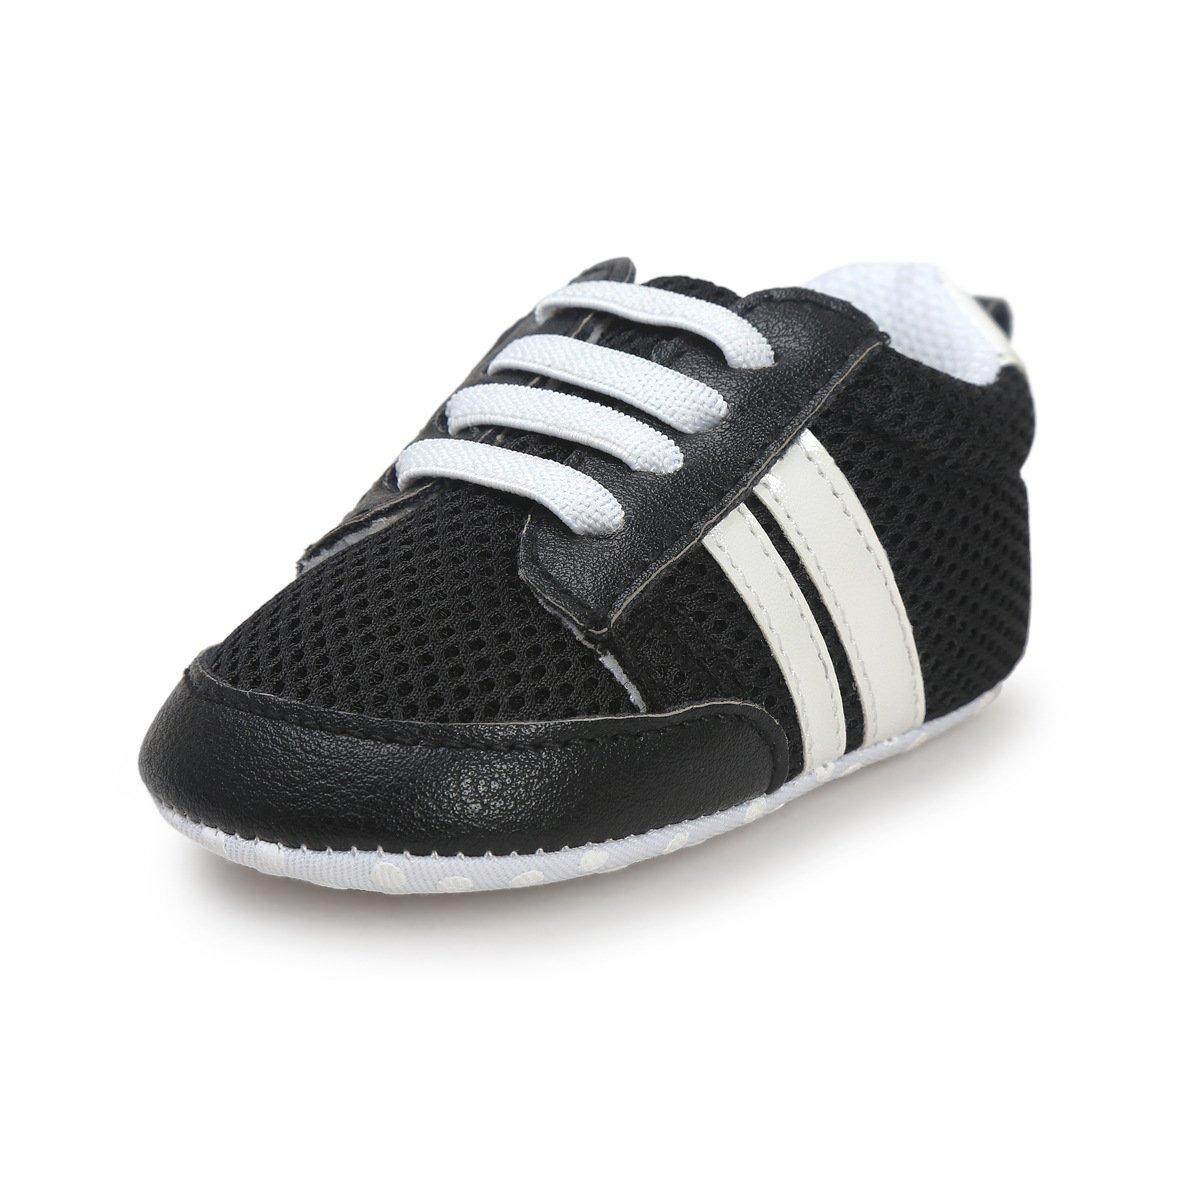 Tutoo Unisex Baby Shoes Boys Girls Toddler Summer Breathable Mesh Running Sneakers Infant First Walkers Newborn Prewalker